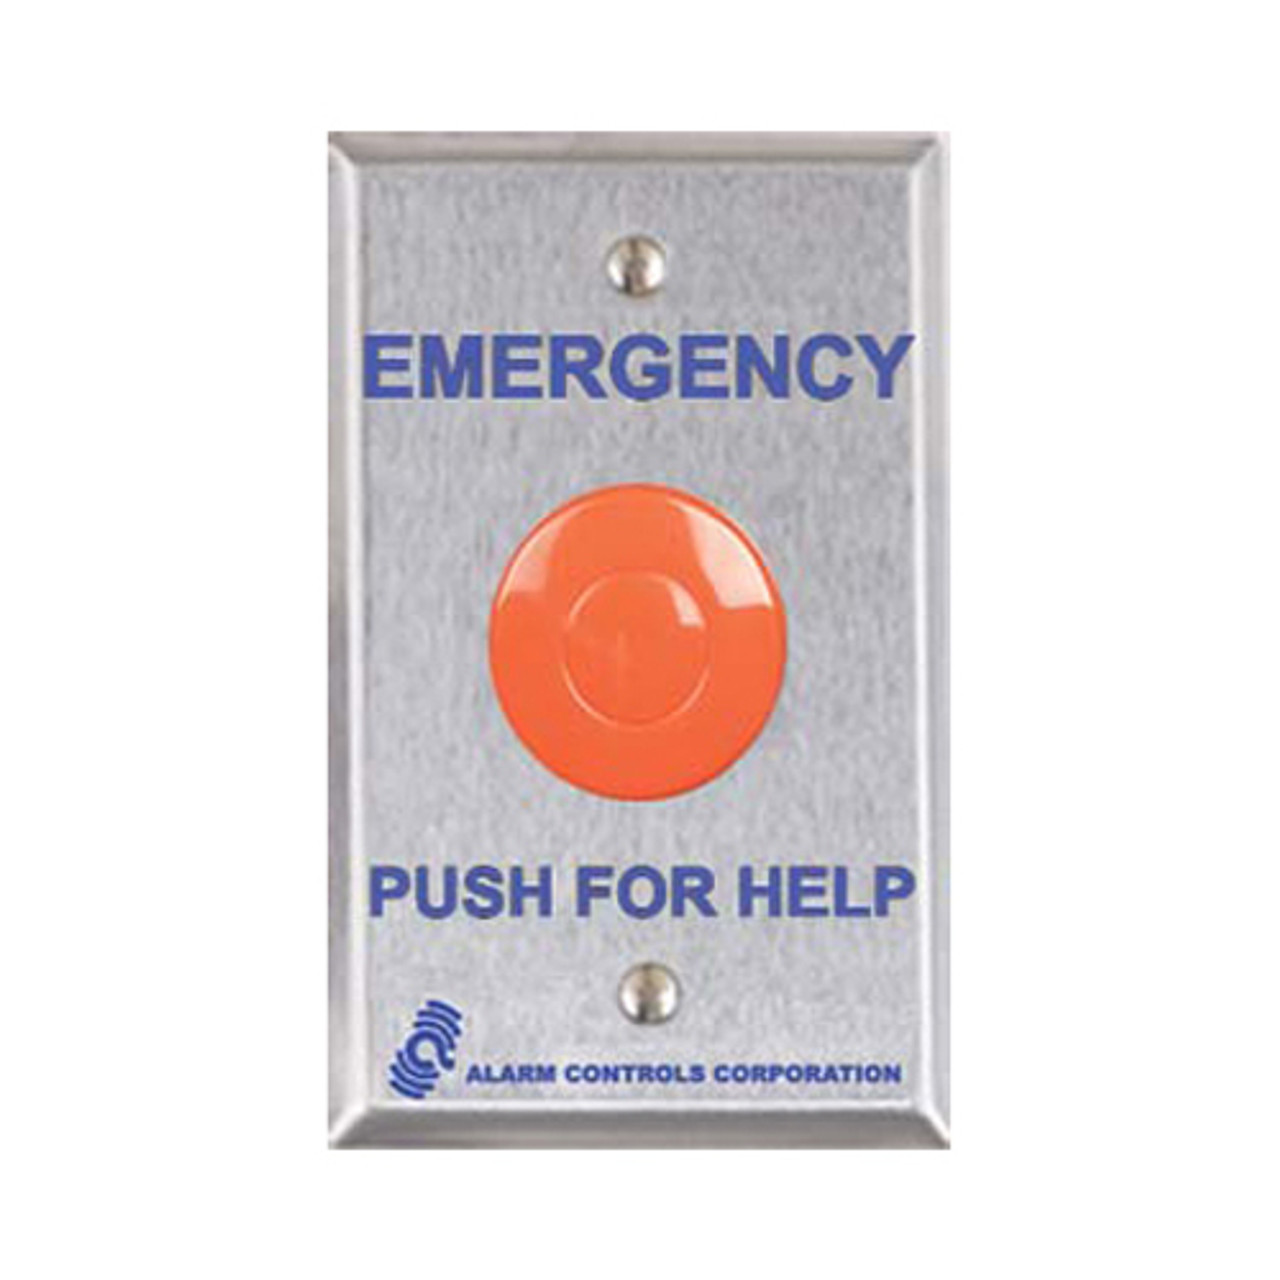 ASP-PBL-1 ASP Alarm Control Latching Pushbutton Panic Stations